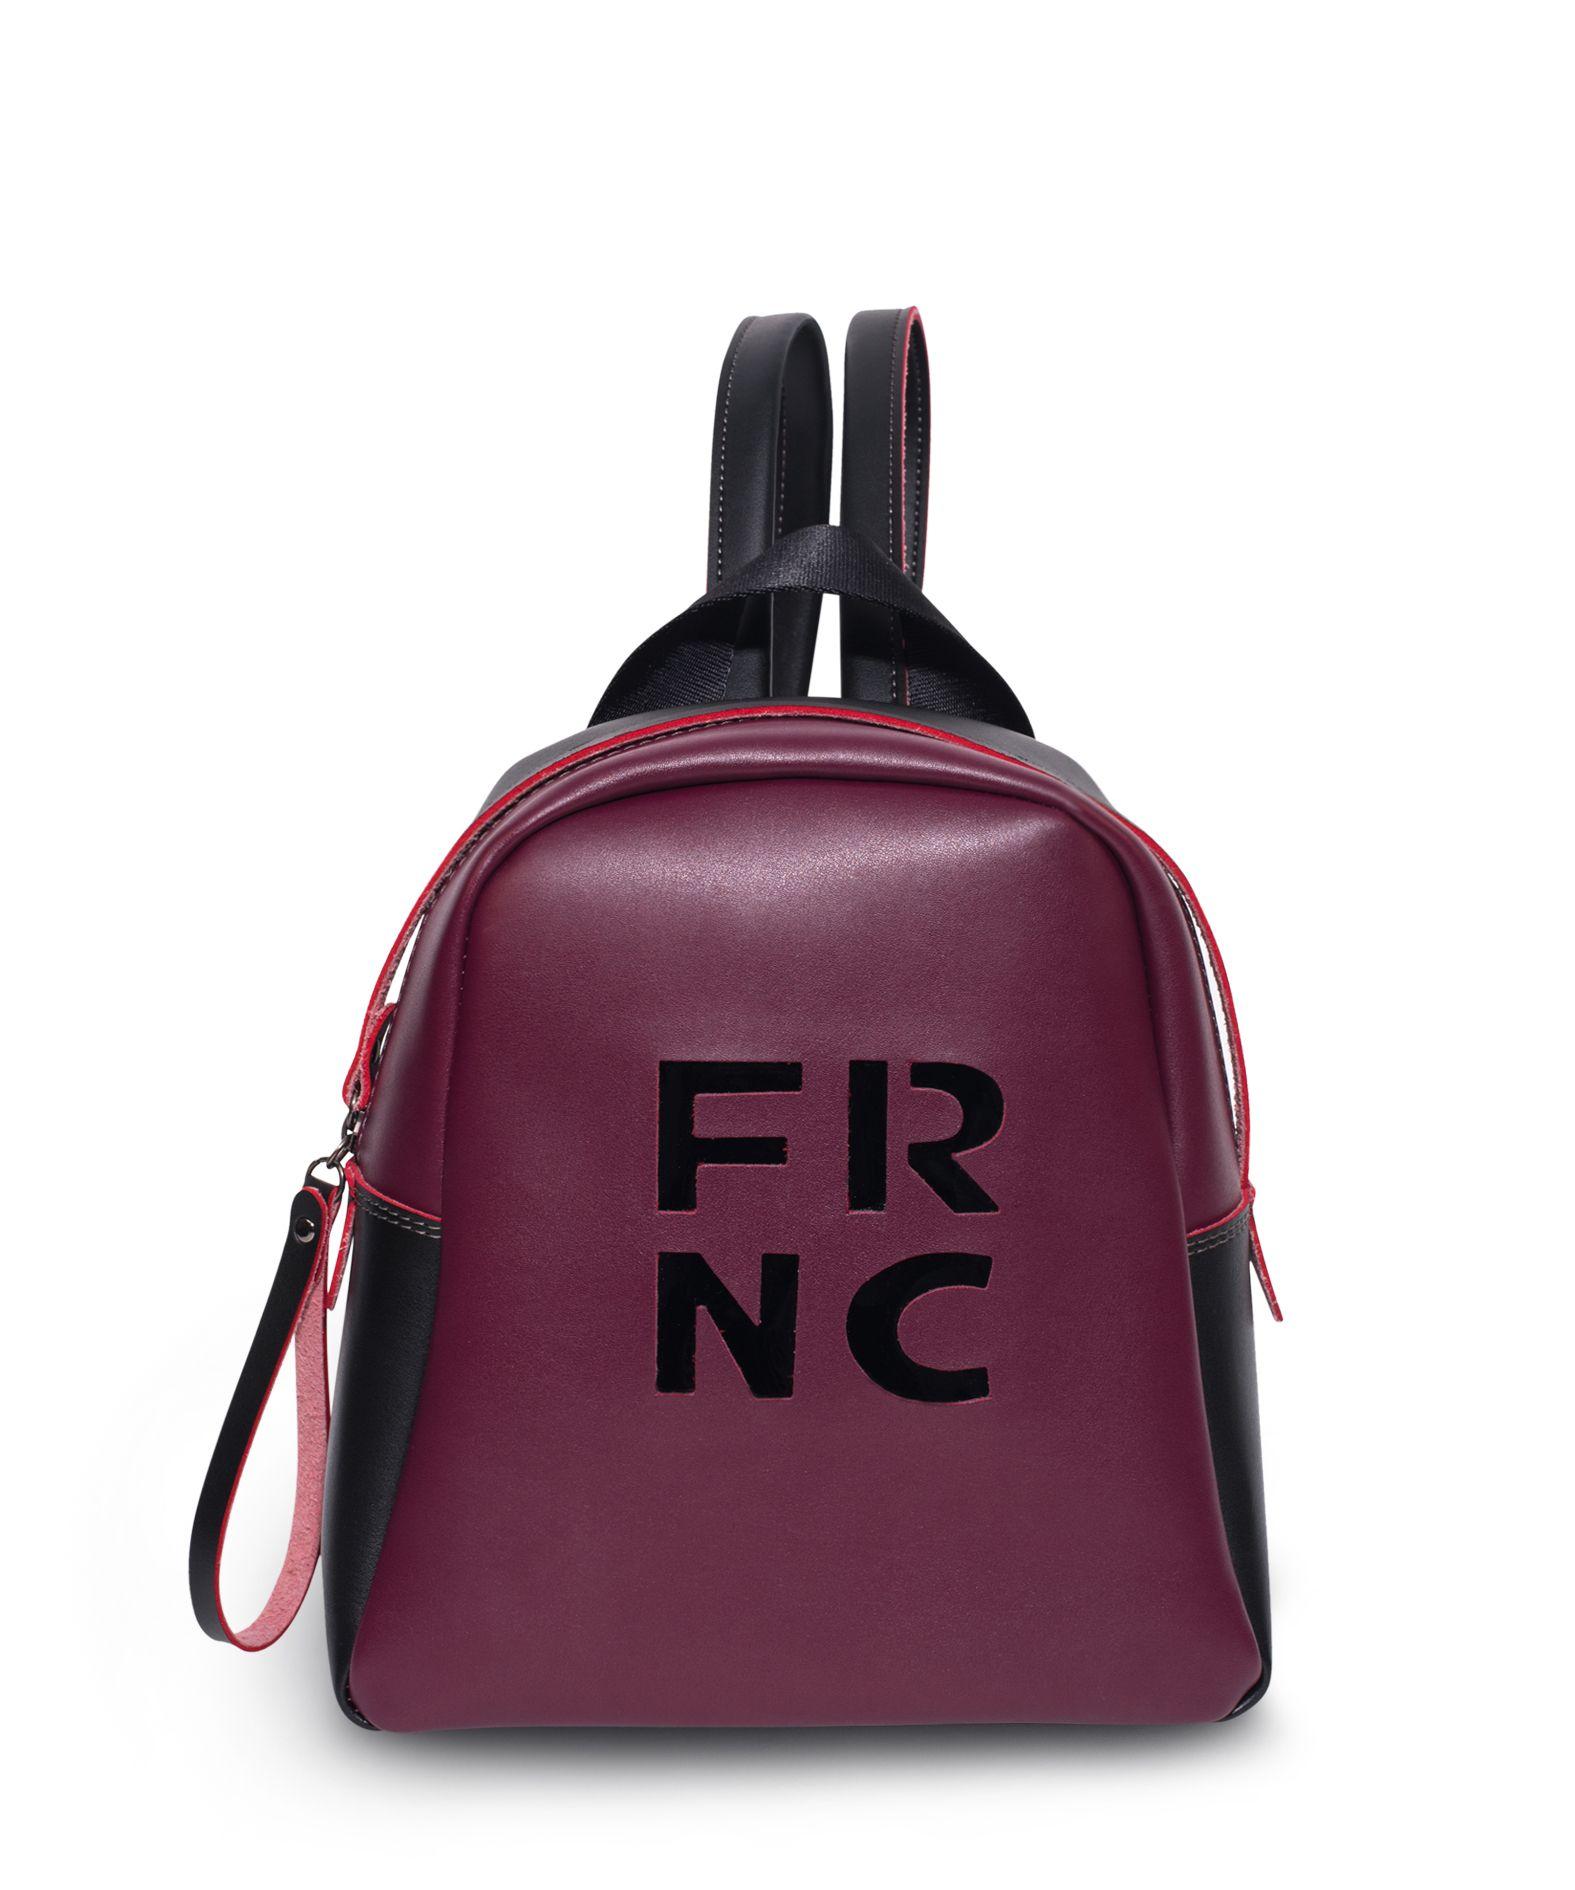 FRNC small-medium backpack Bordeaux | Medium backpack